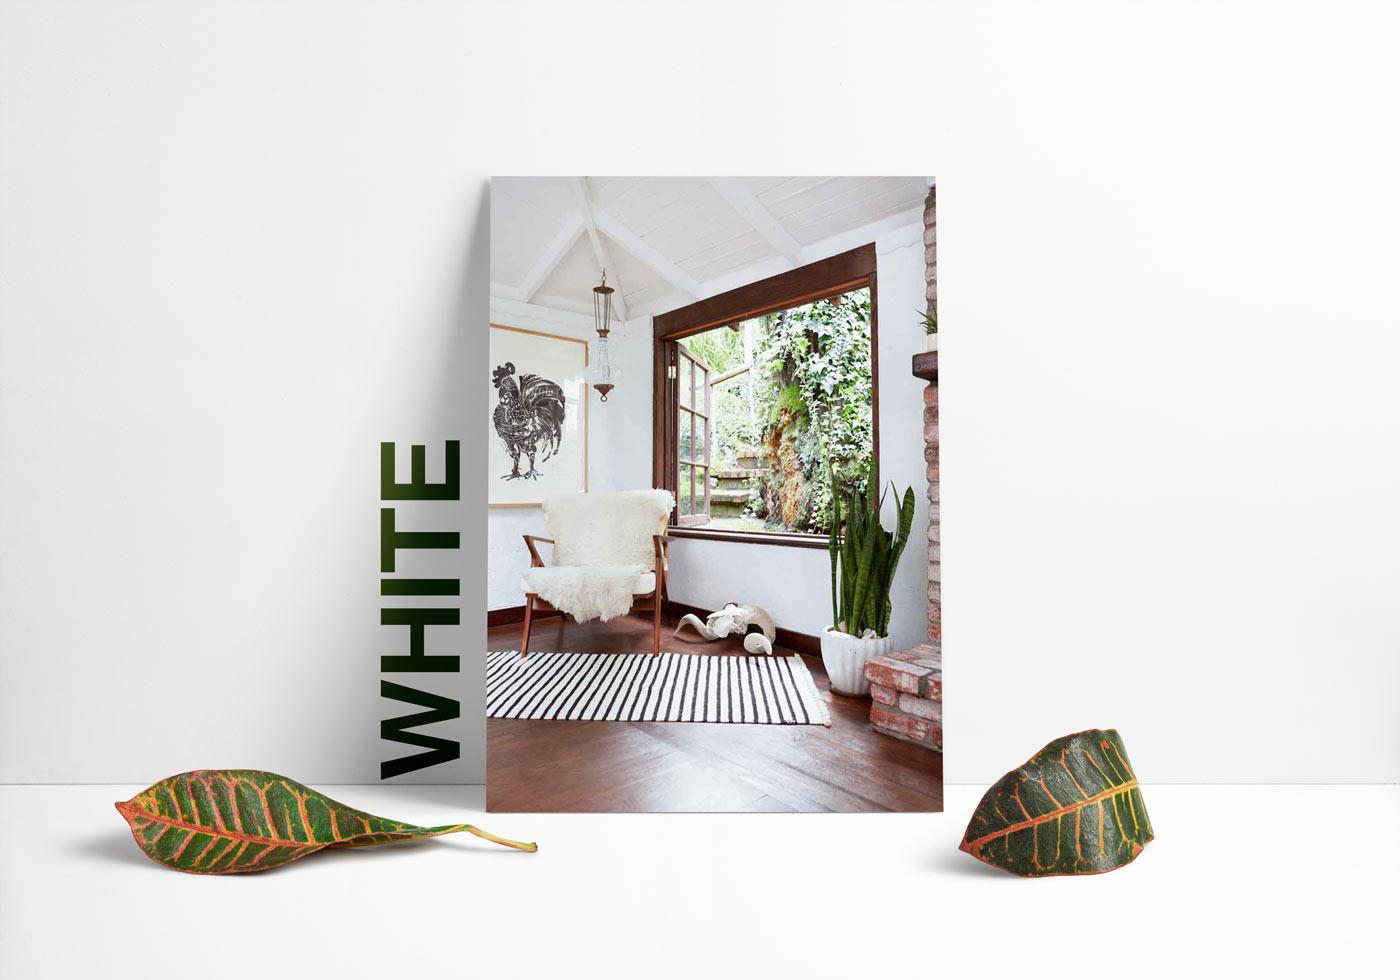 white in interior design - طبع یا مزاج رنگ ها در دکوراسیون داخلی